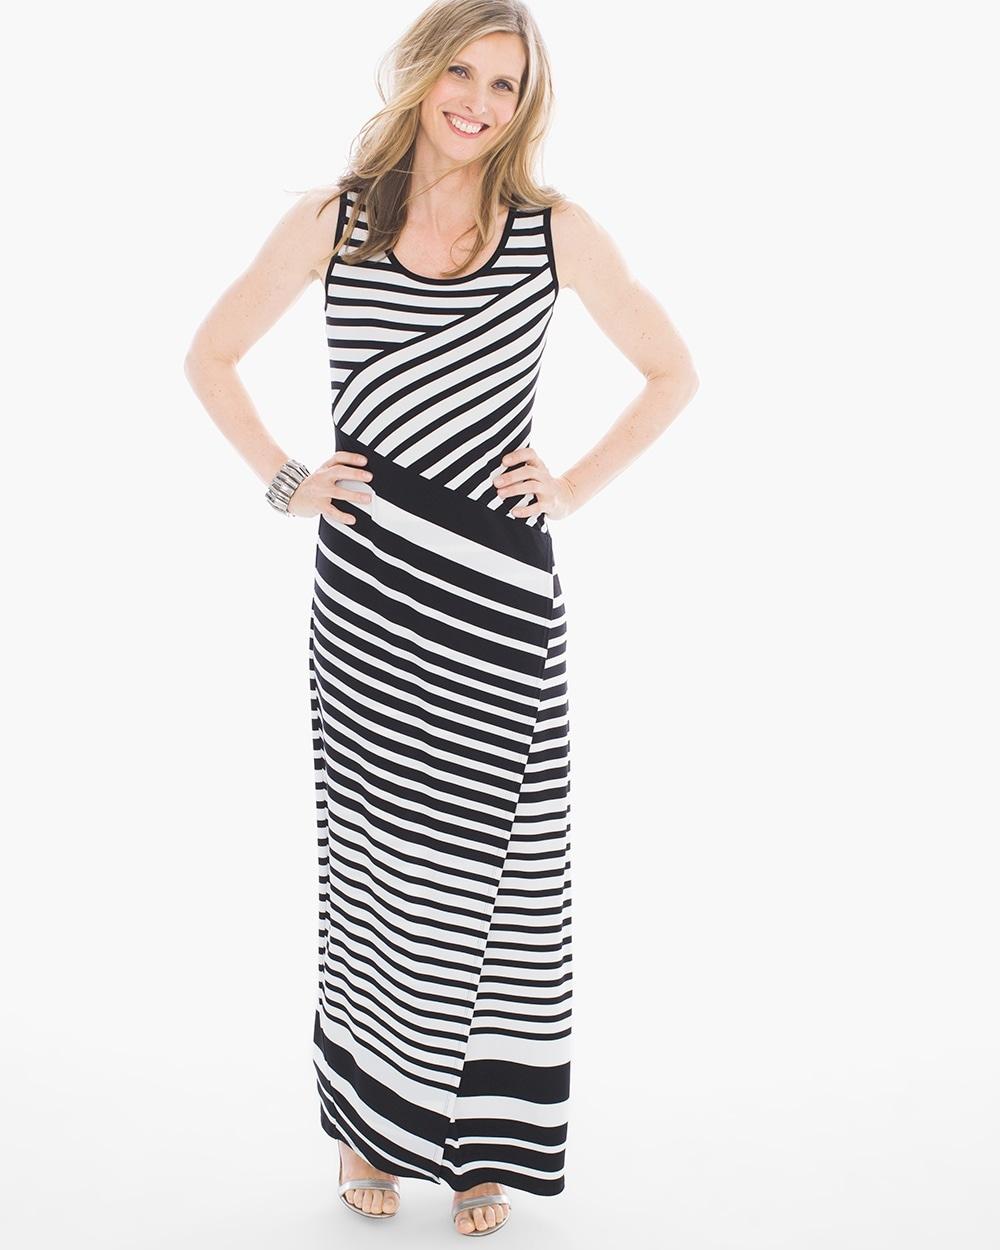 Black and white diagonal striped dress